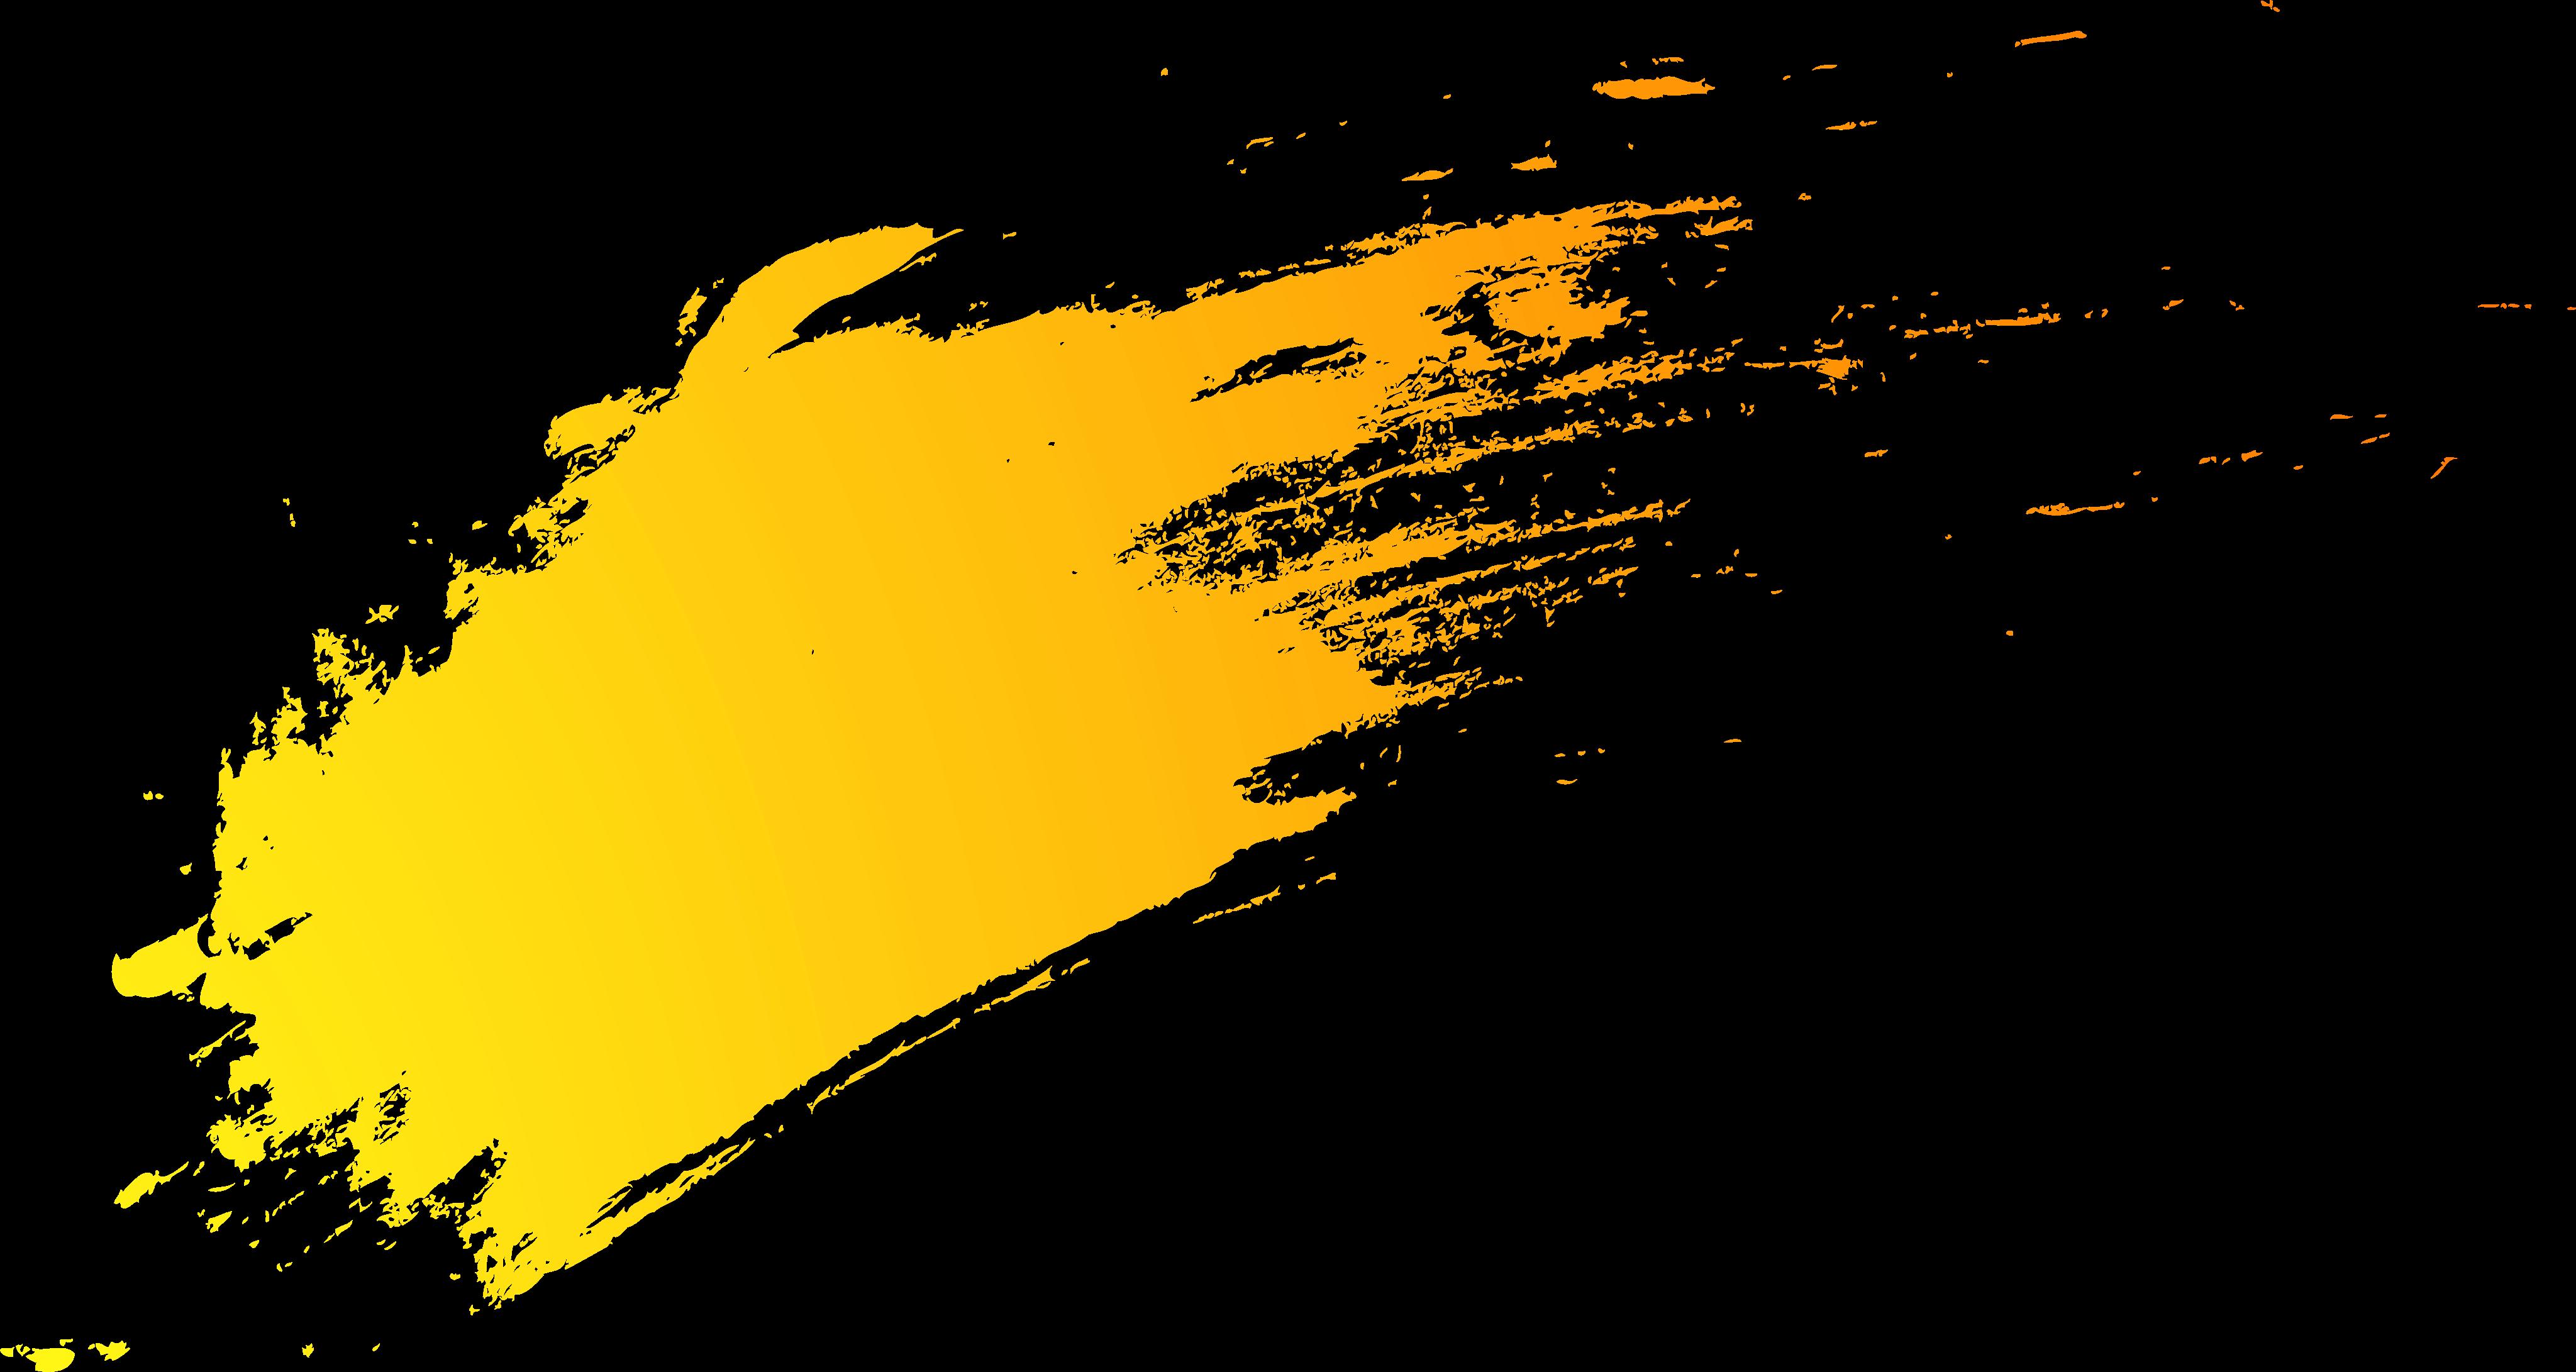 paint paintsplash paintstroke yellow gradient freetoedi...